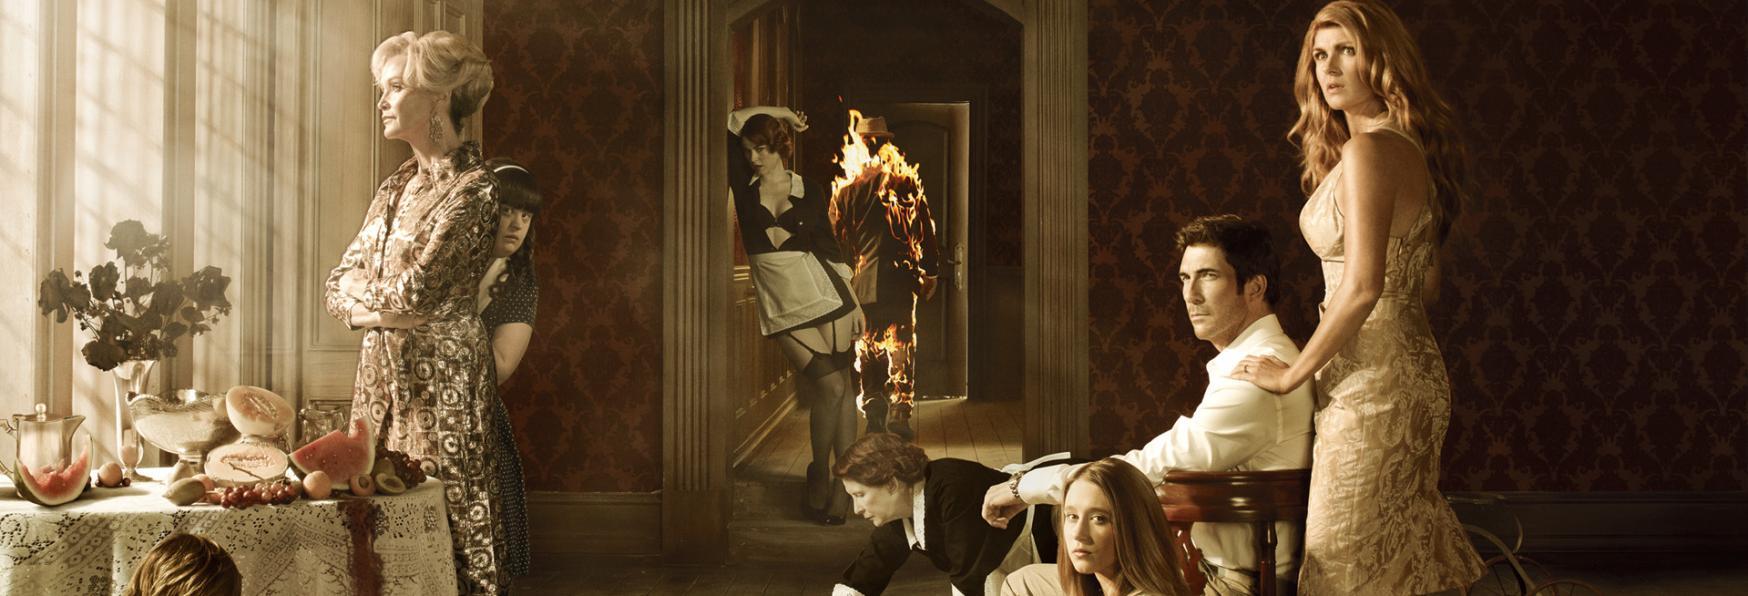 American Horror Story: Sarah Paulson dirigerà lo Spin-off della nota Serie TV